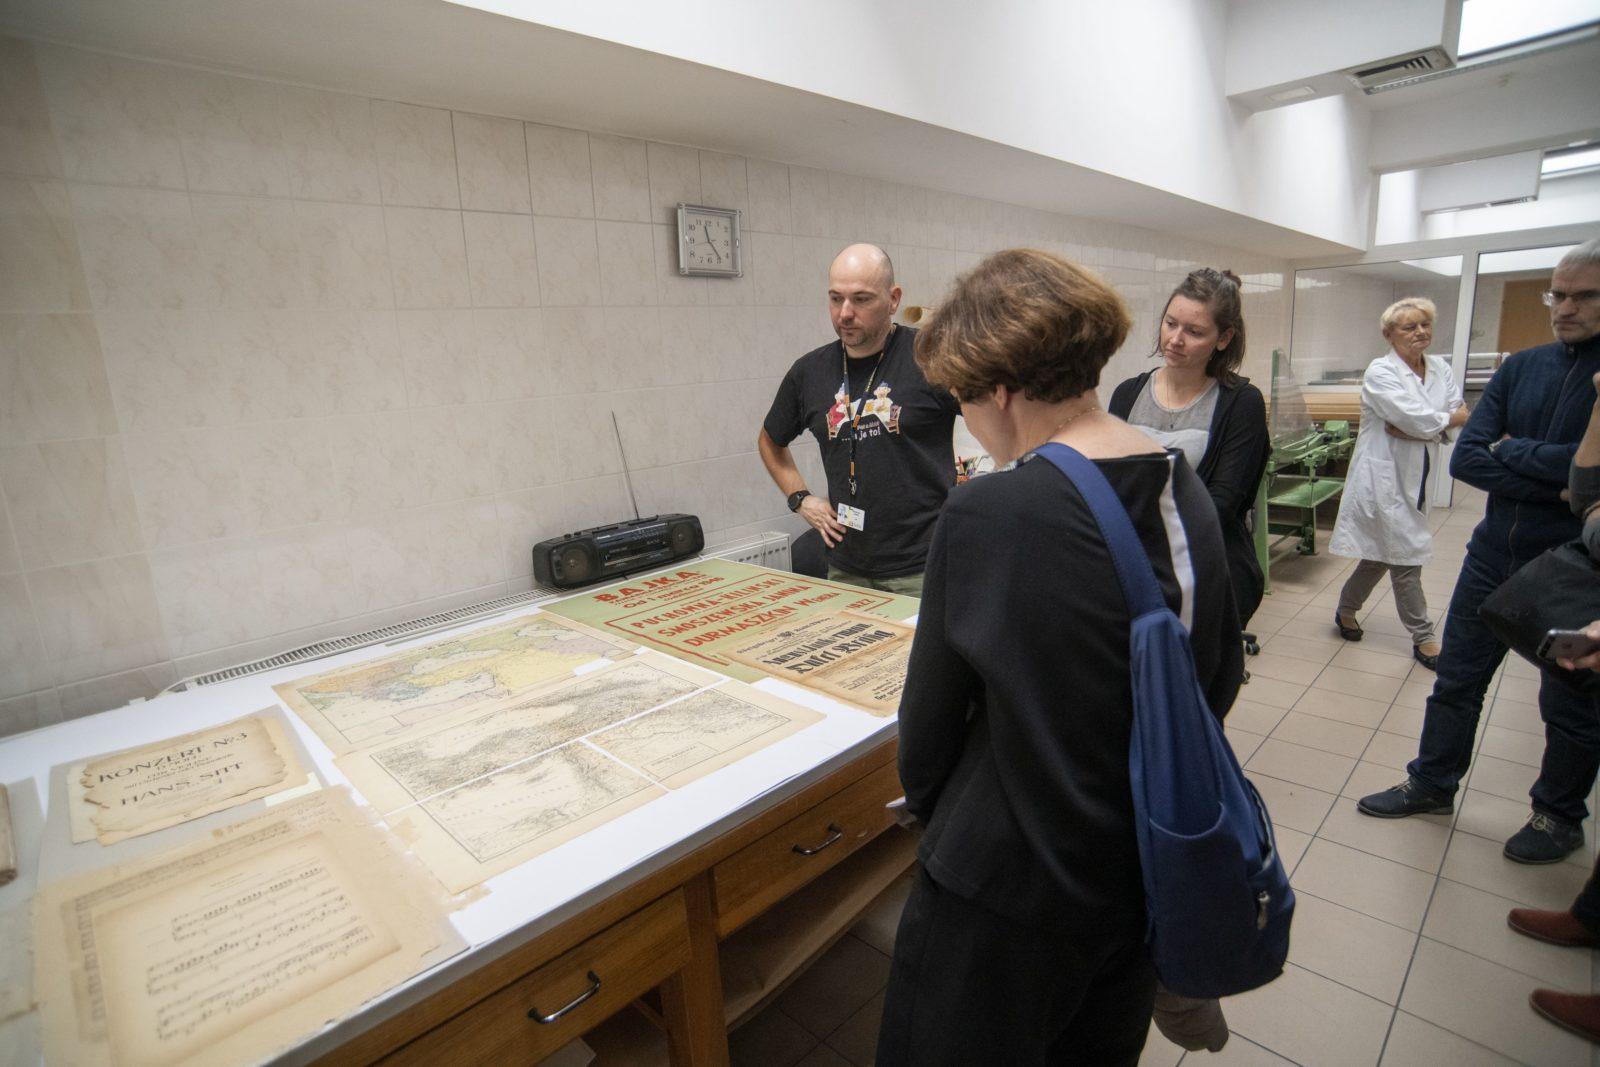 Warschau_2019_Tour_Library_of_Poland_Warsaw_Stasiuk_Konrad_194